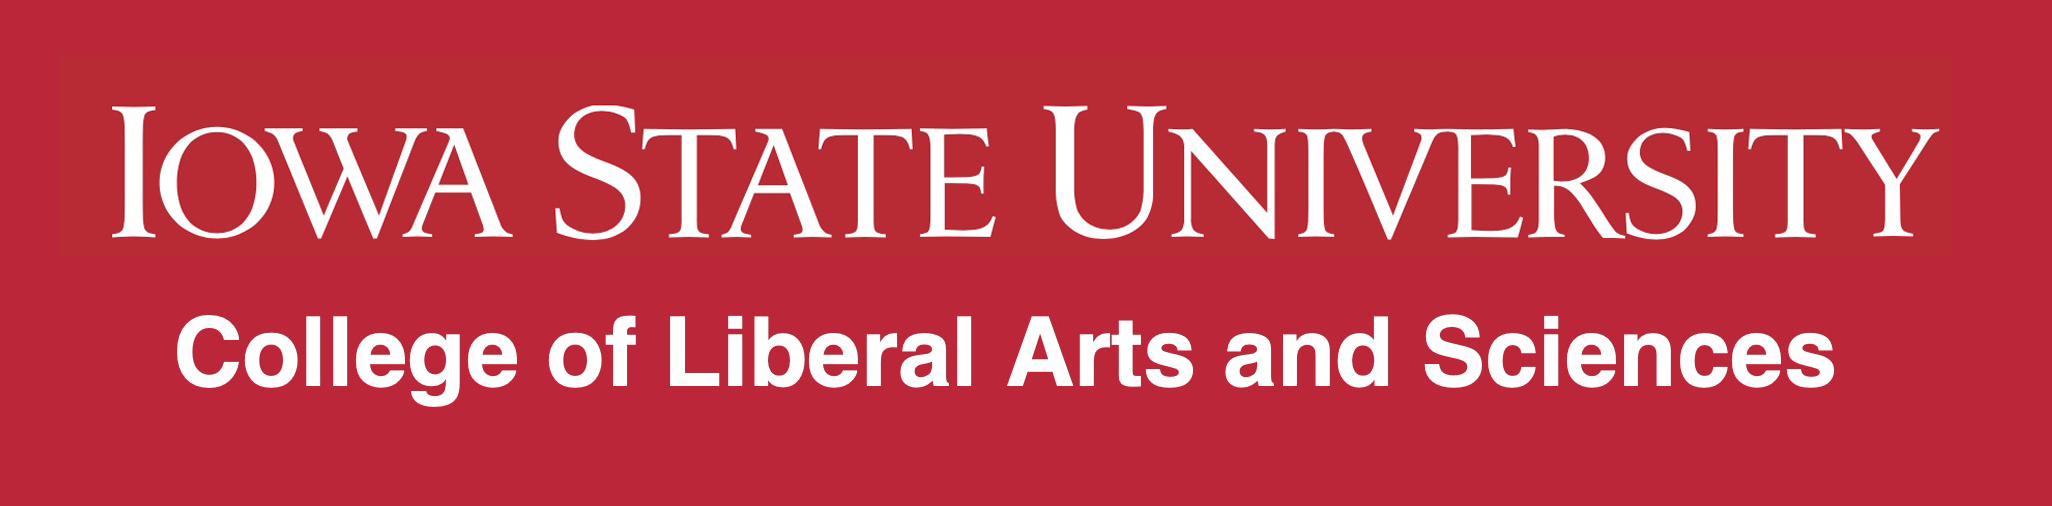 ISU-liberal arts.jpg